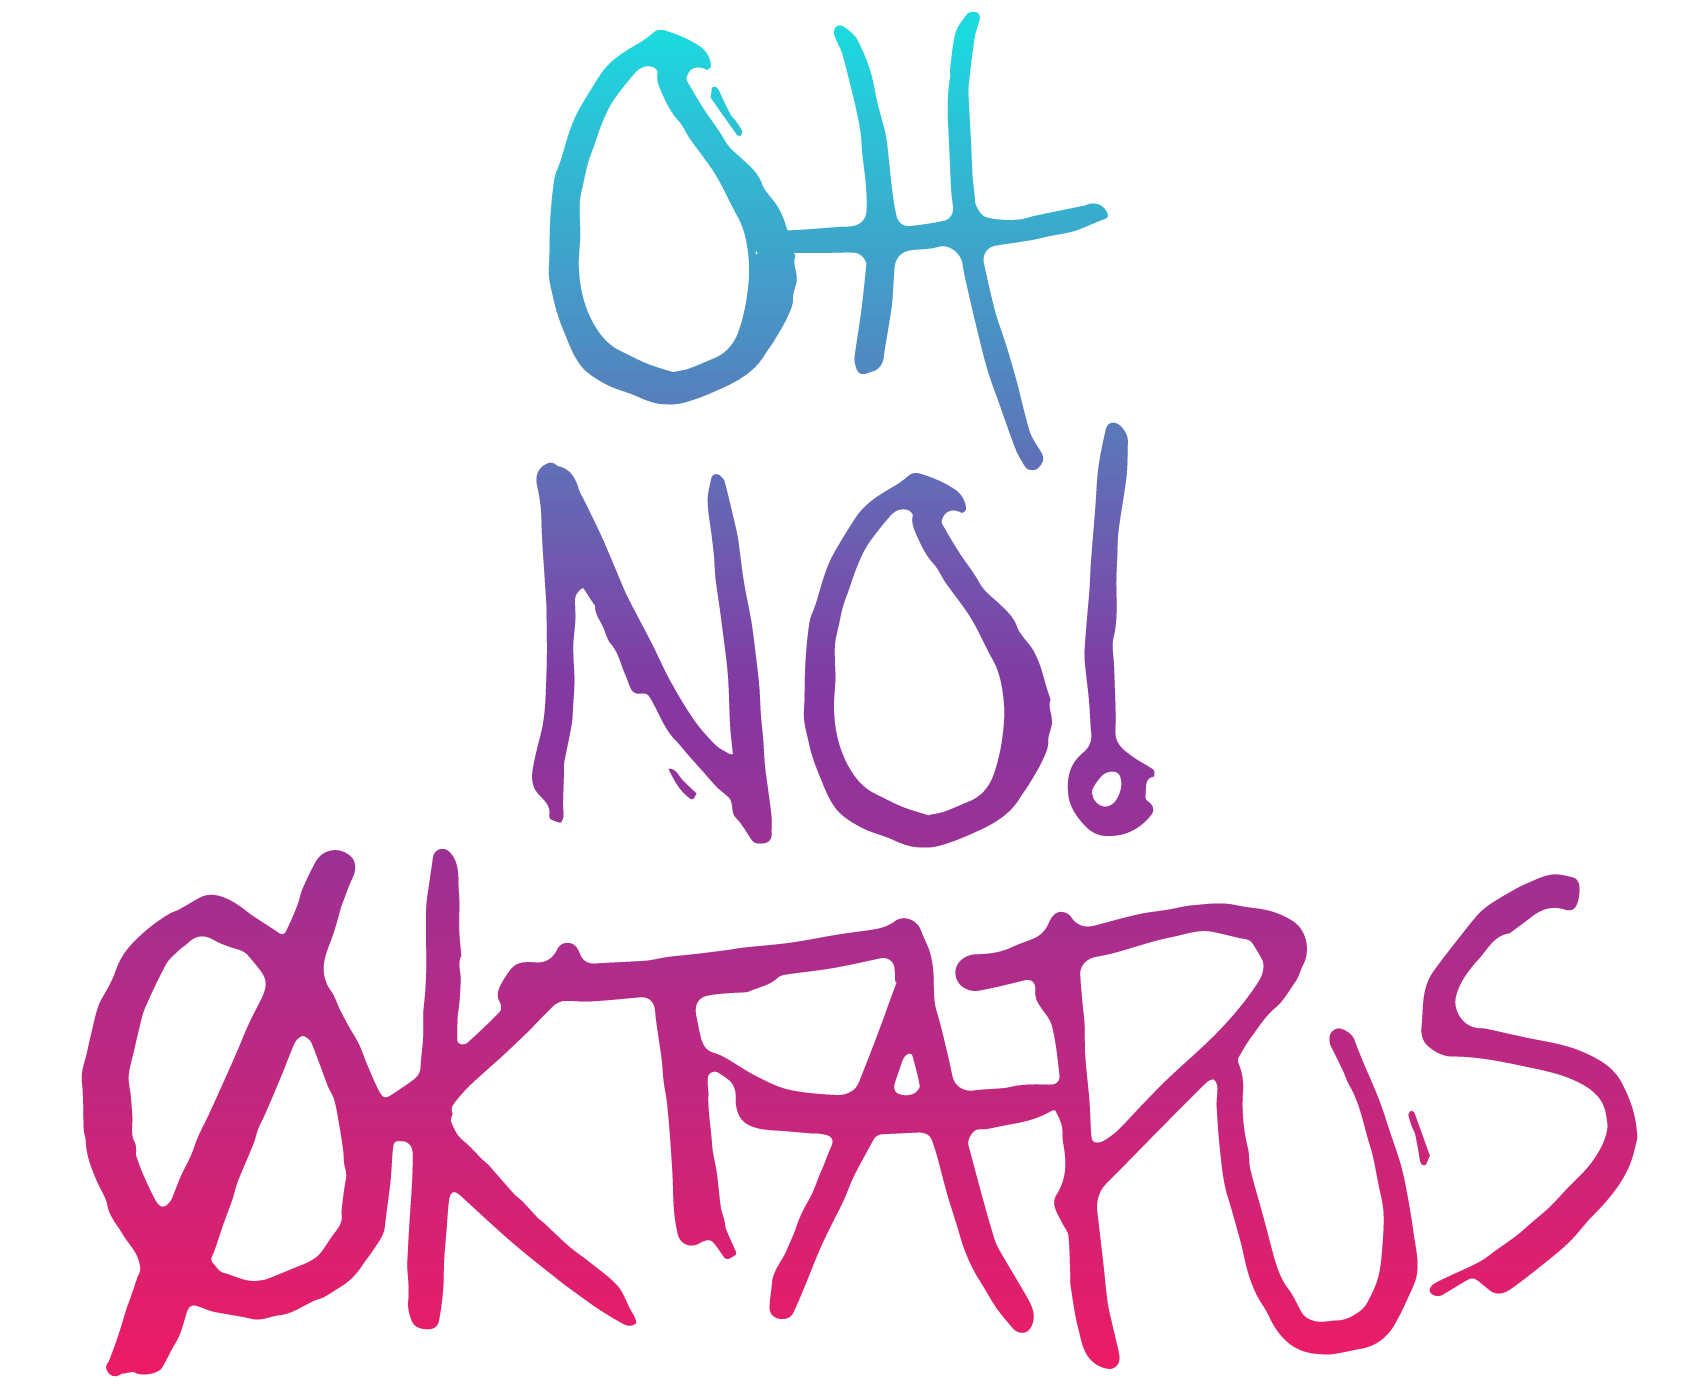 OH_NO_OKTAPUS_Gradient_LOGO